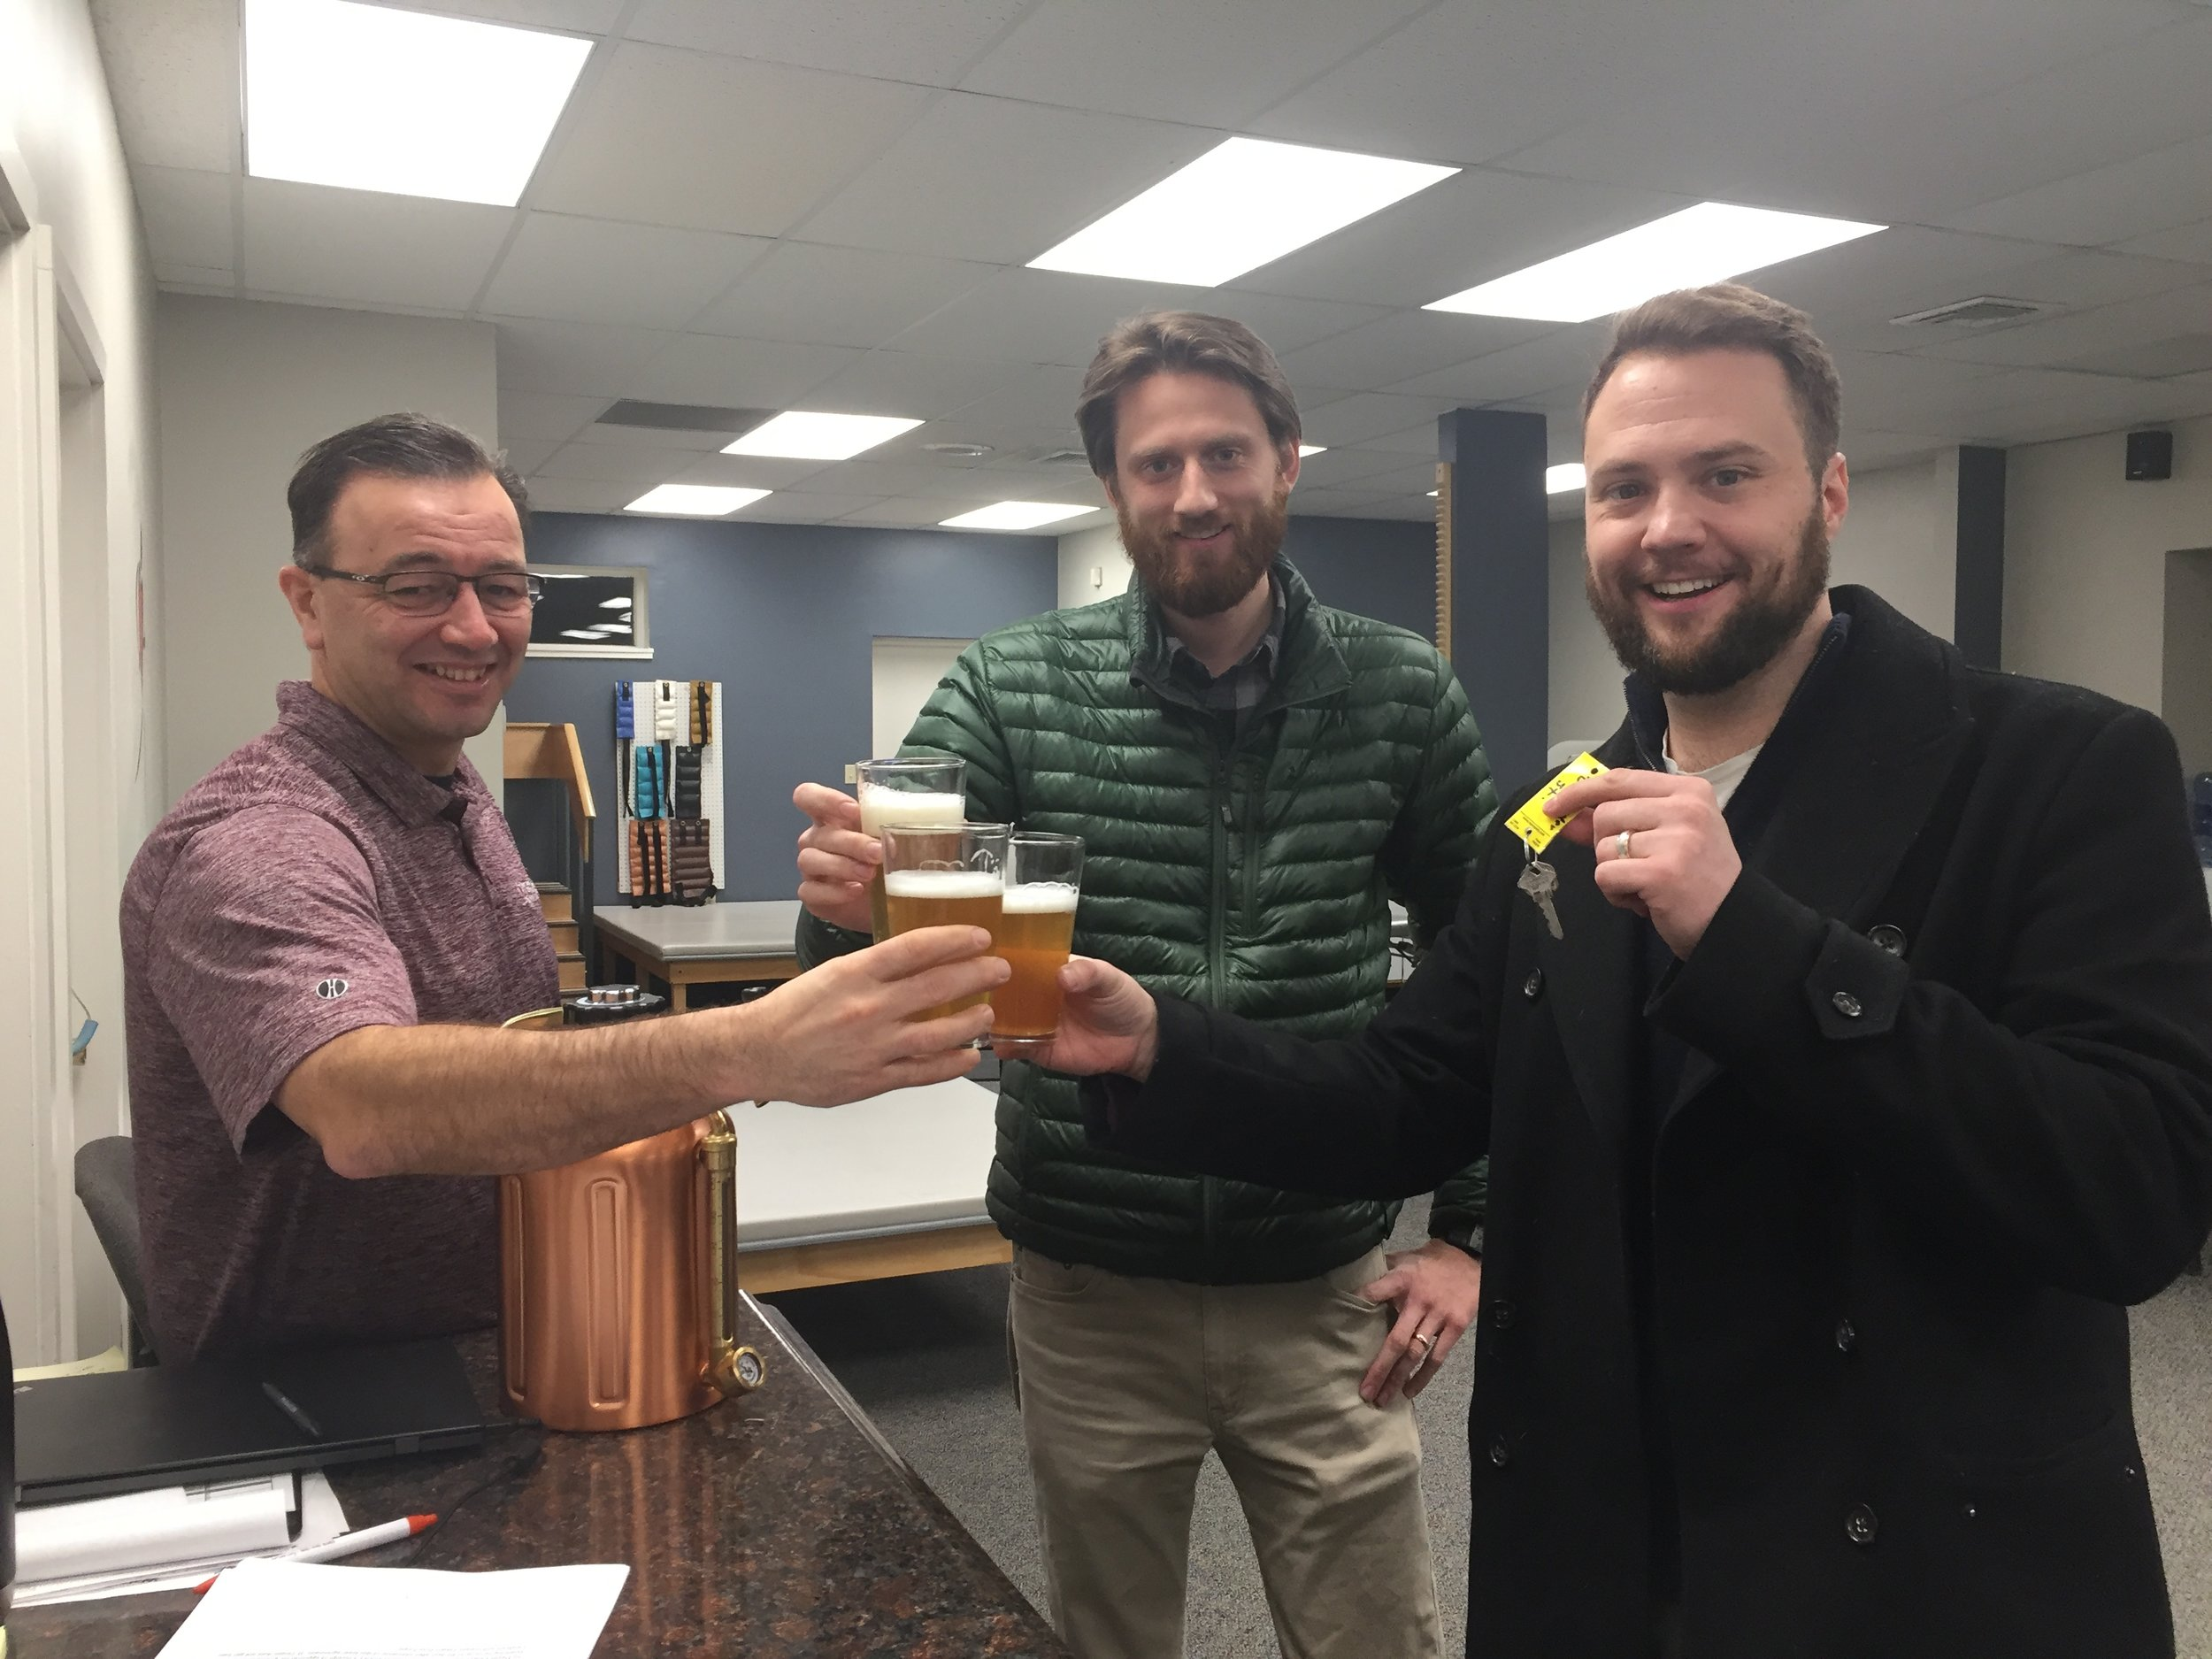 Scott (Landlord), Dayne, and Mike Celebrating over some fresh Placebo Effect.